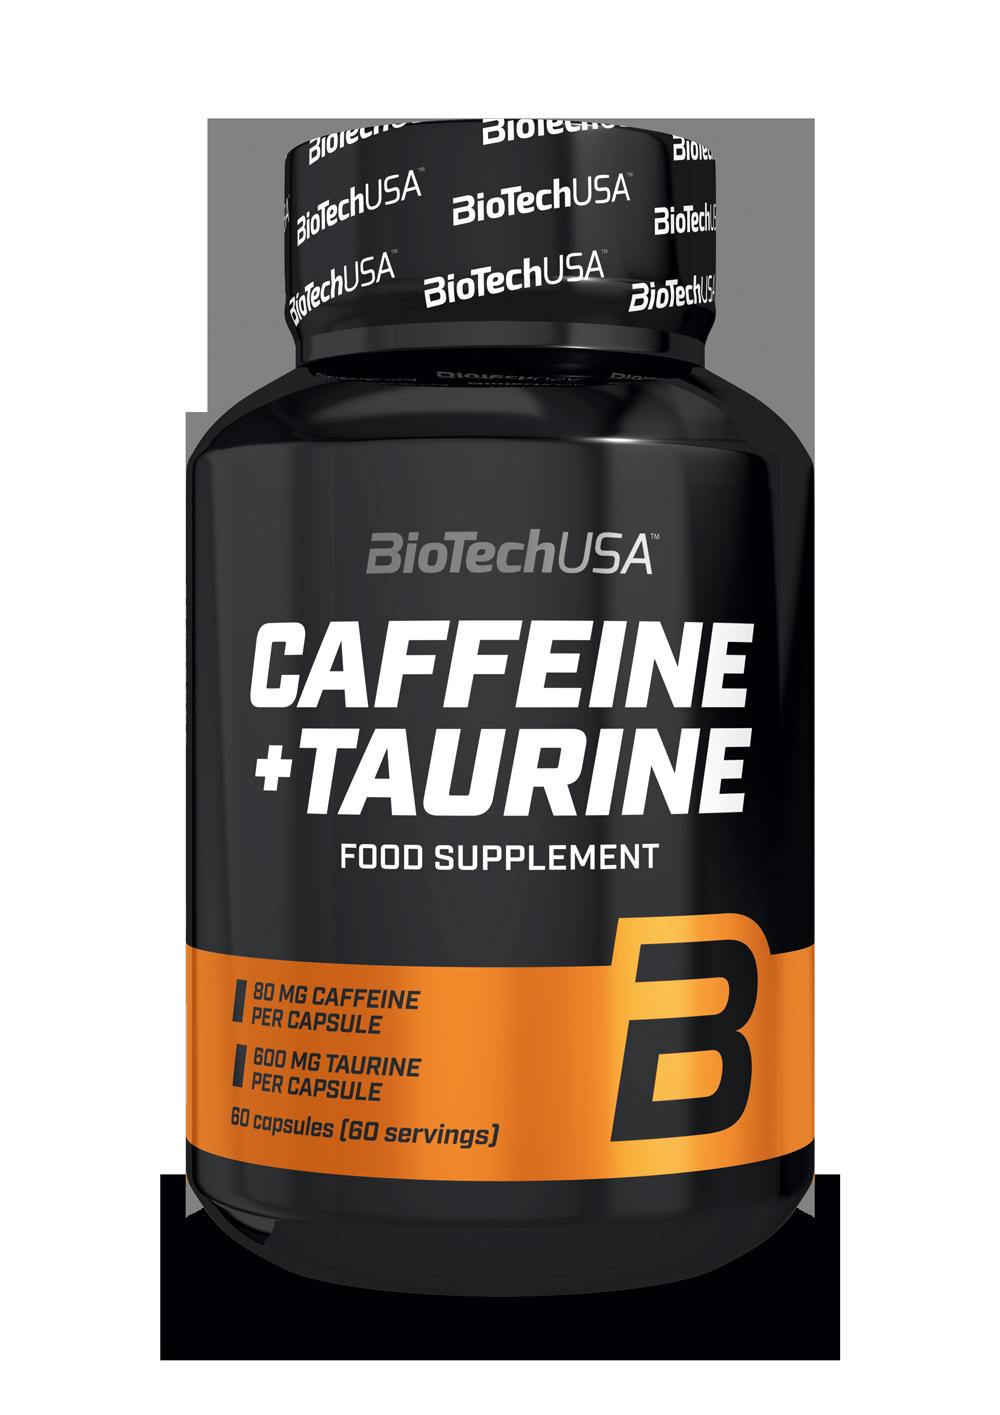 Caffeine + Taurine BioTech USA